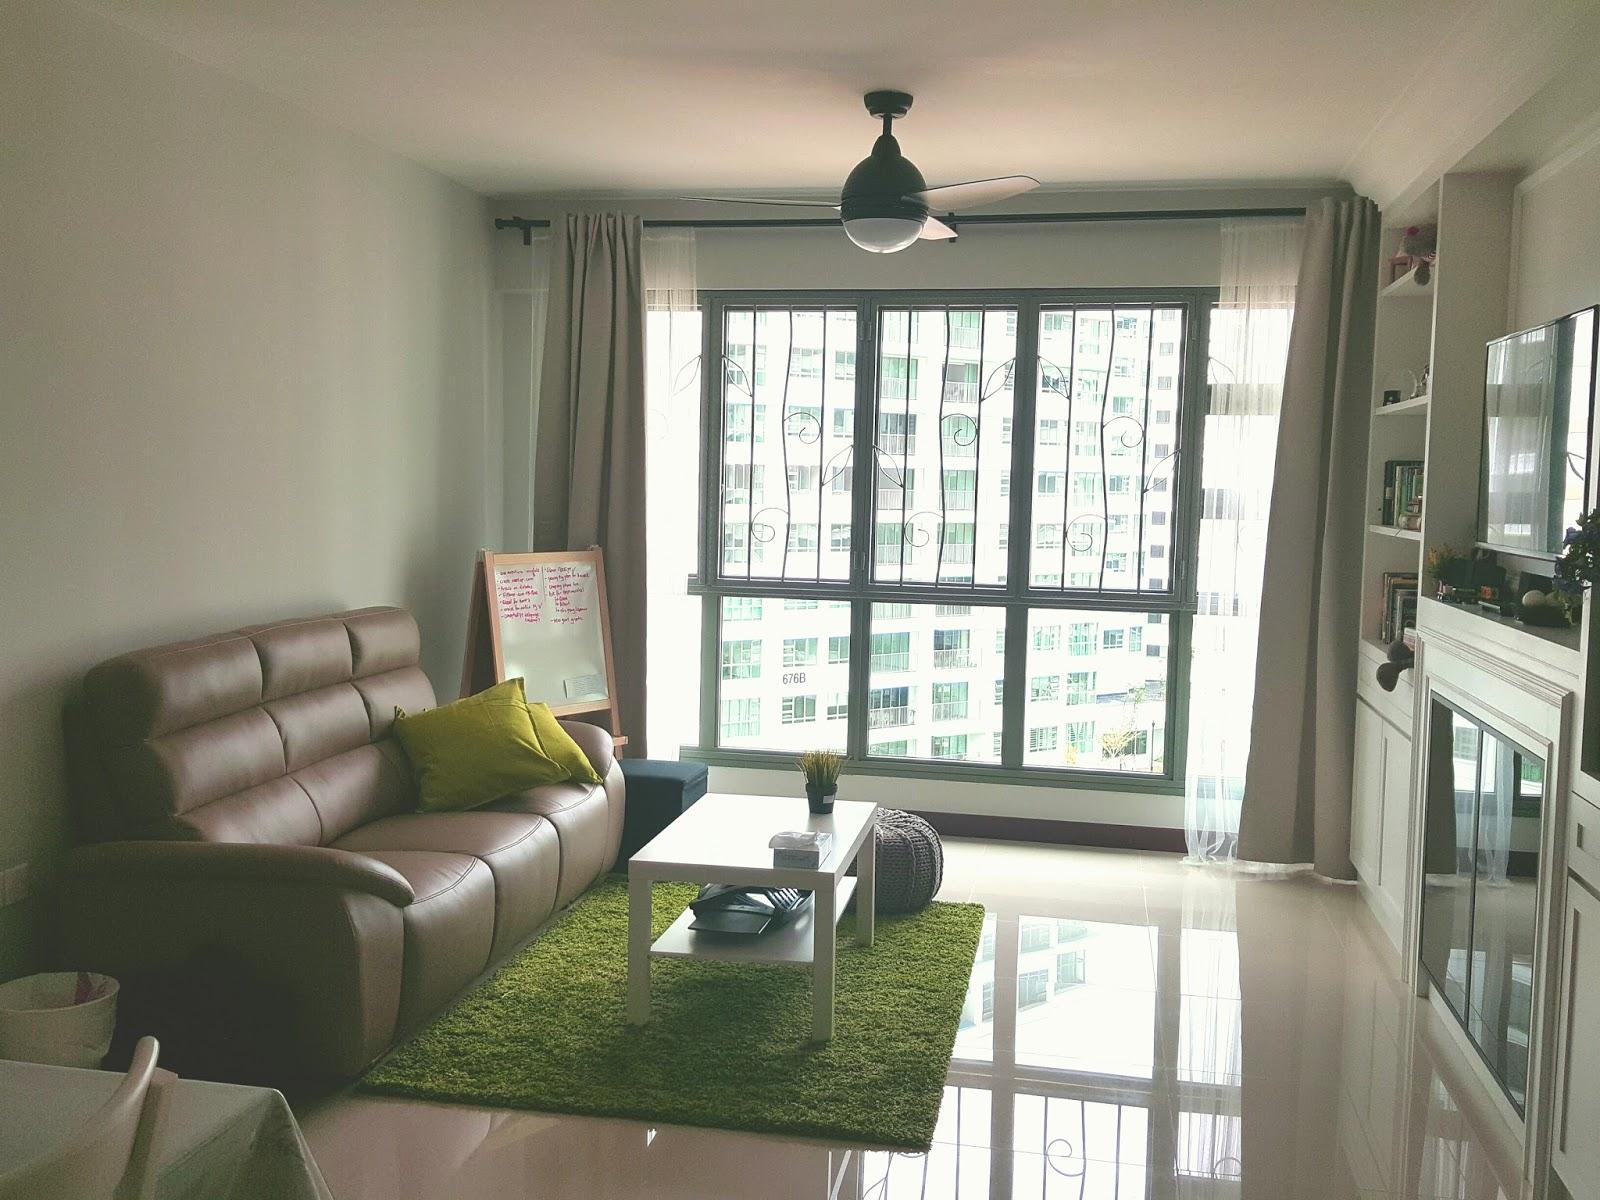 Punggol brooke water way hdb 5 room renovation - Completed Nest Waterway Brooks